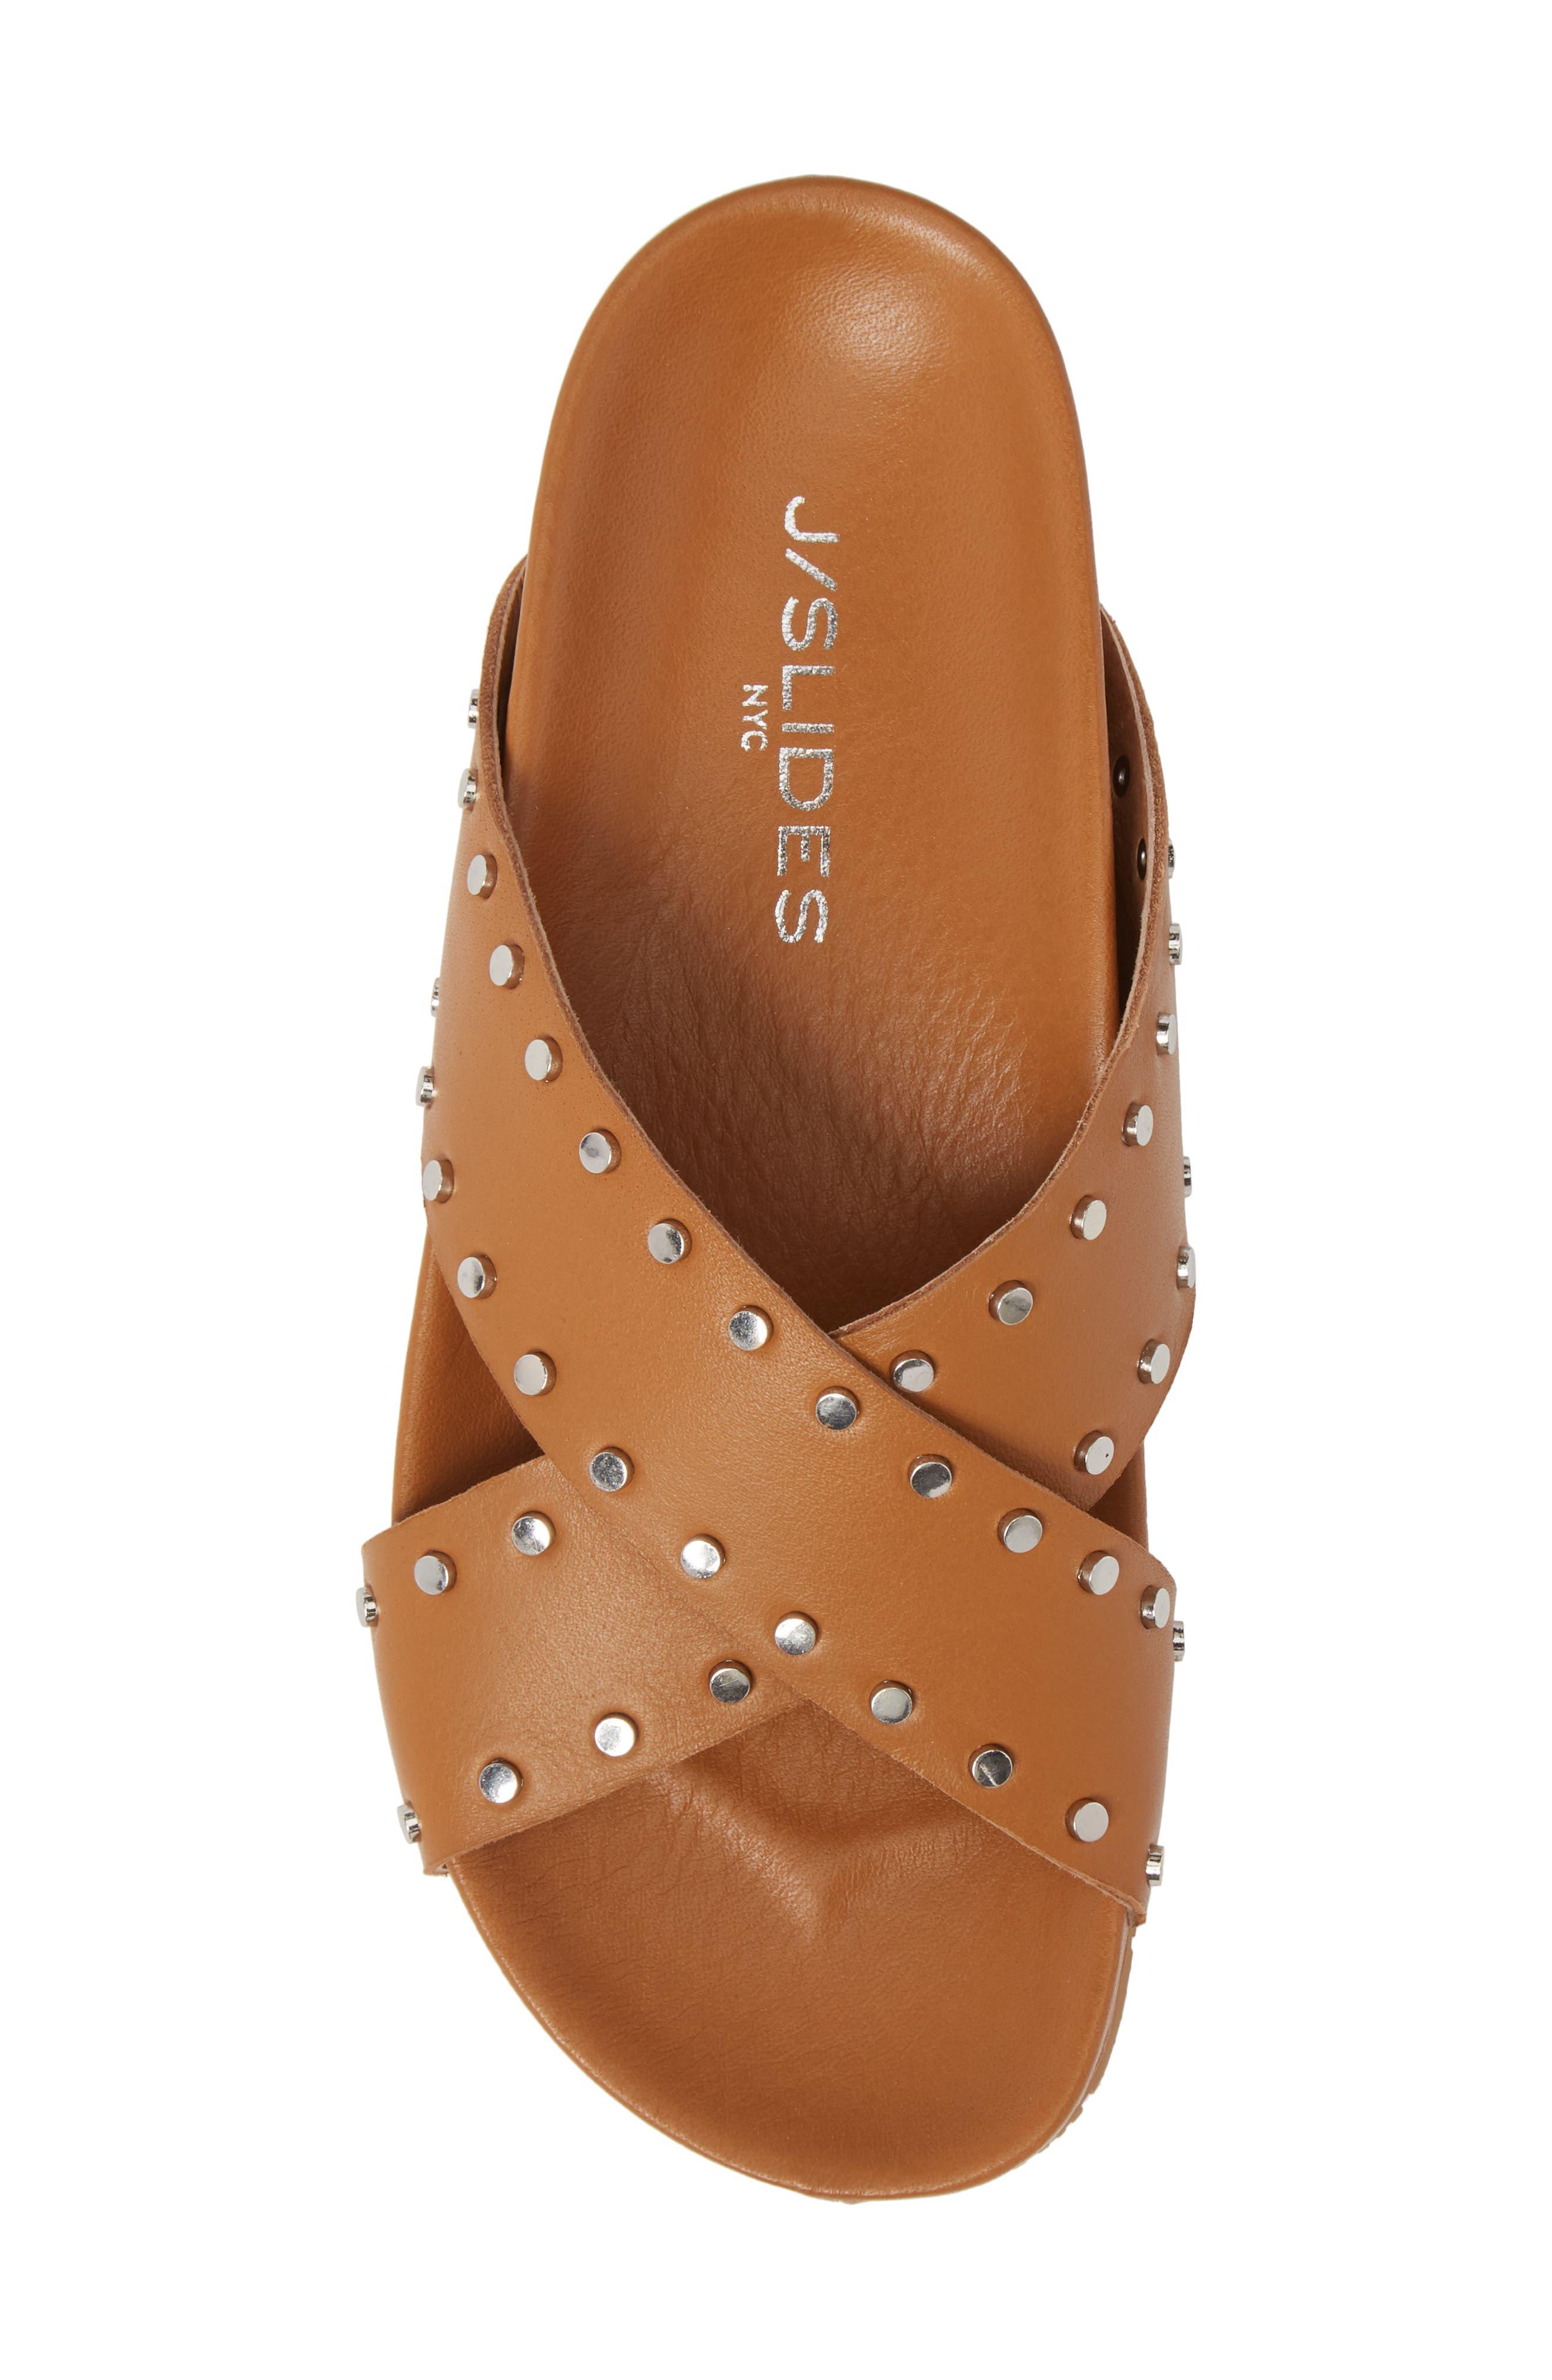 Ellie Studded Slide Sandal,                             Alternate thumbnail 5, color,                             Tan Leather